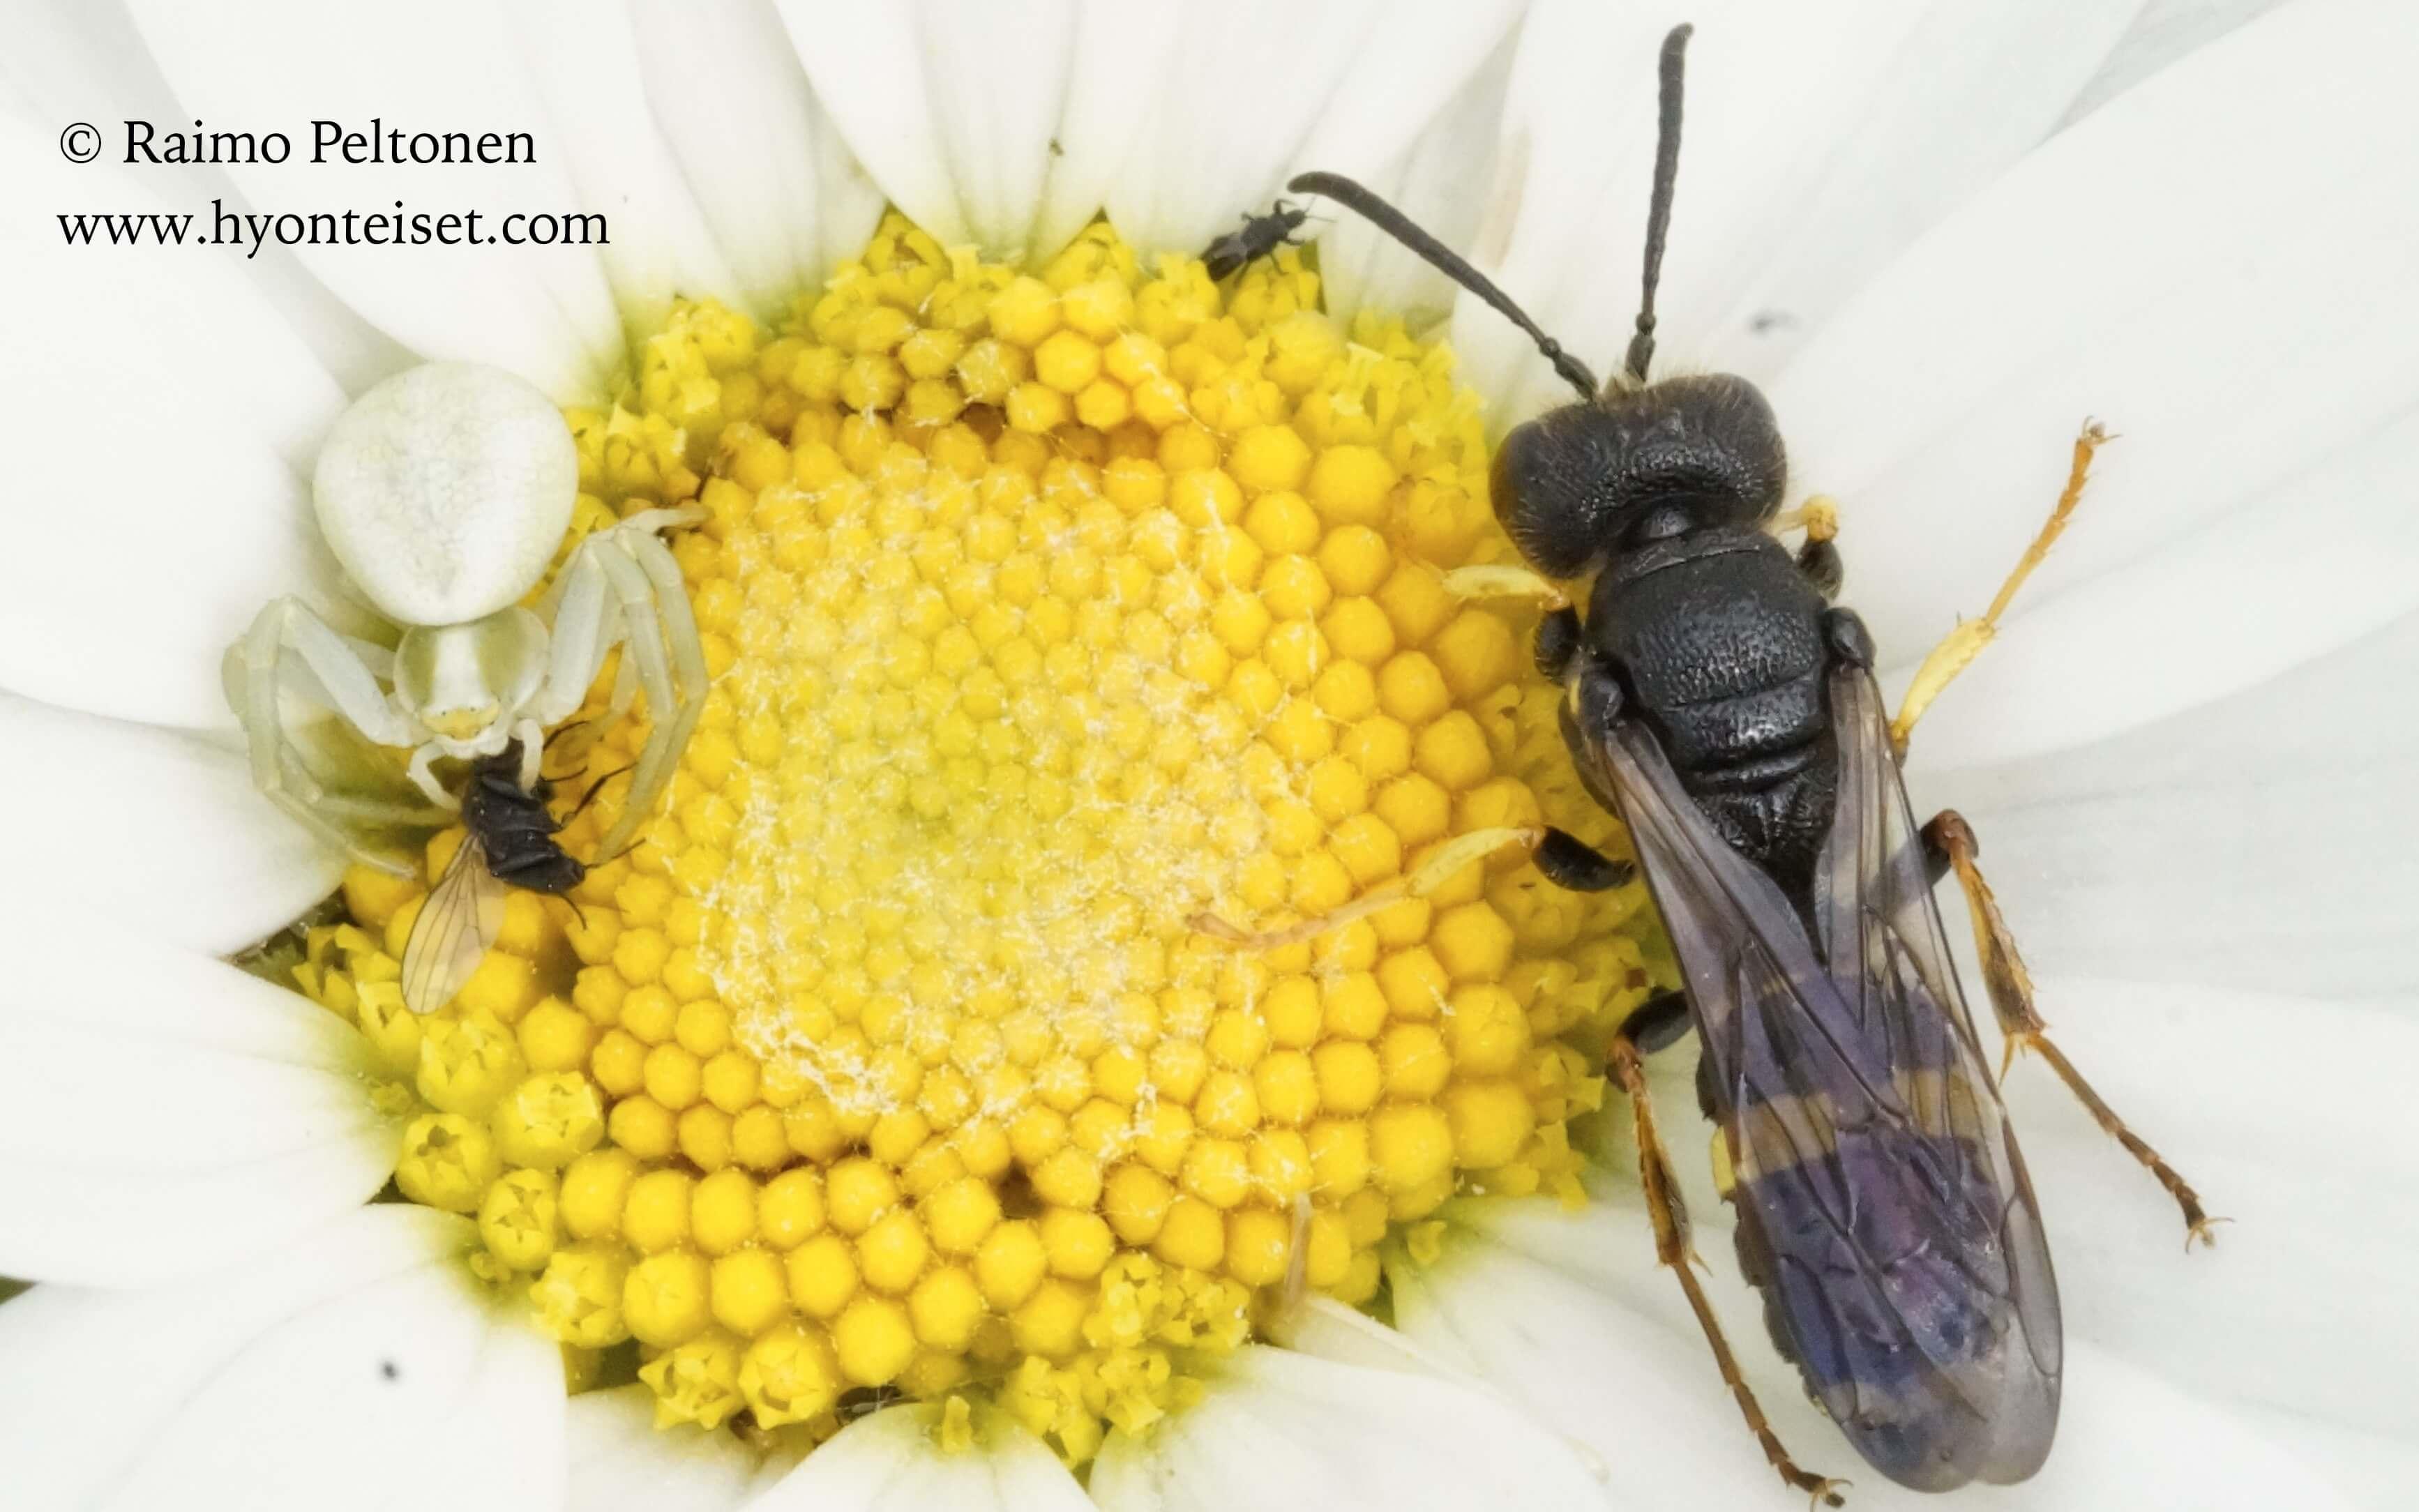 Cerceris rybyensis-mesirengashukka (det. Juho Paukkunen)